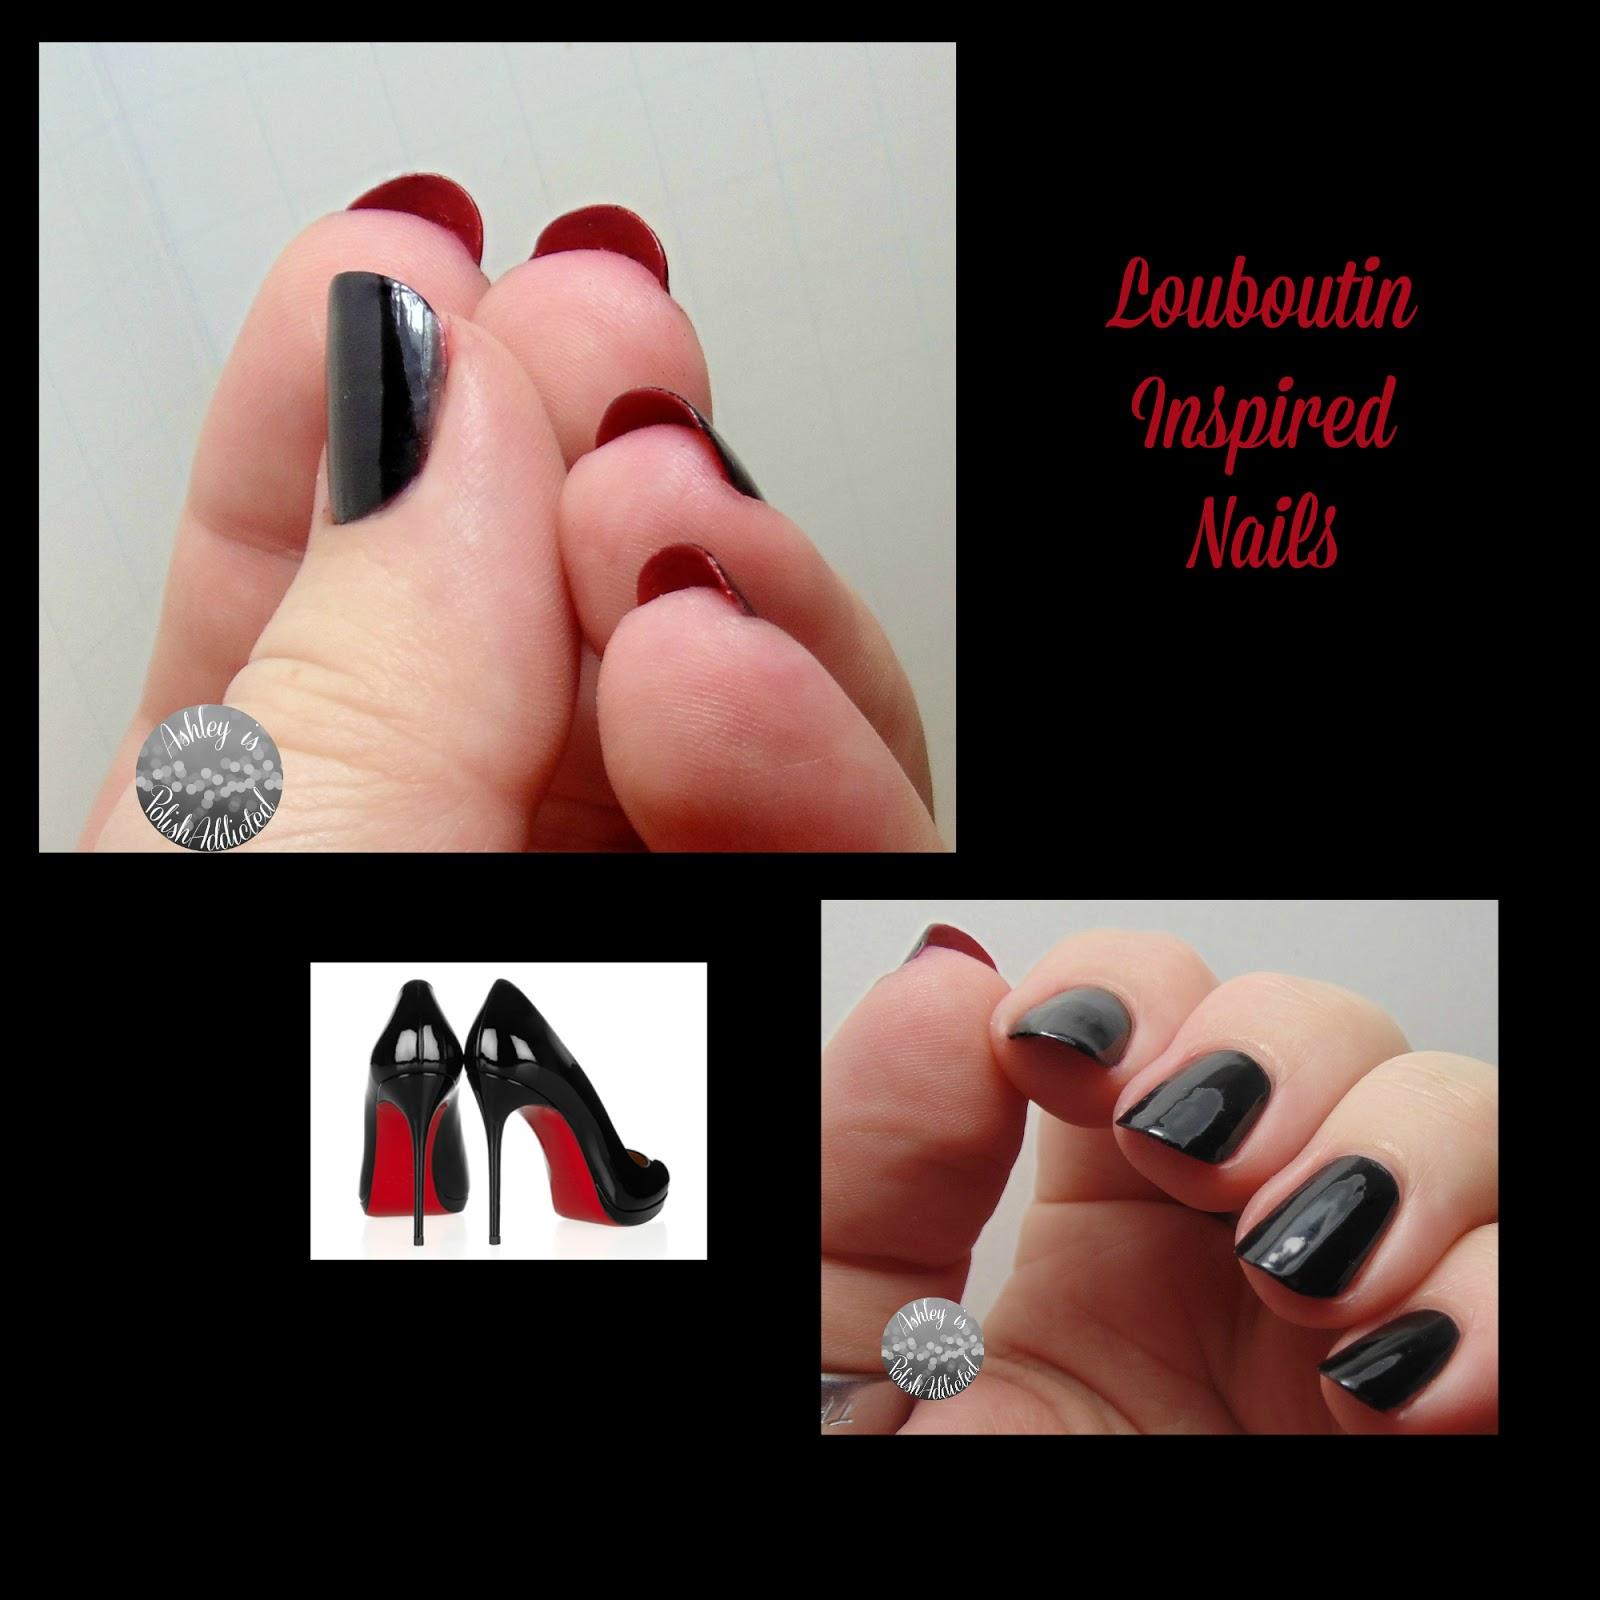 Ashley is PolishAddicted: Christian Louboutin High Heel Inspired Nails